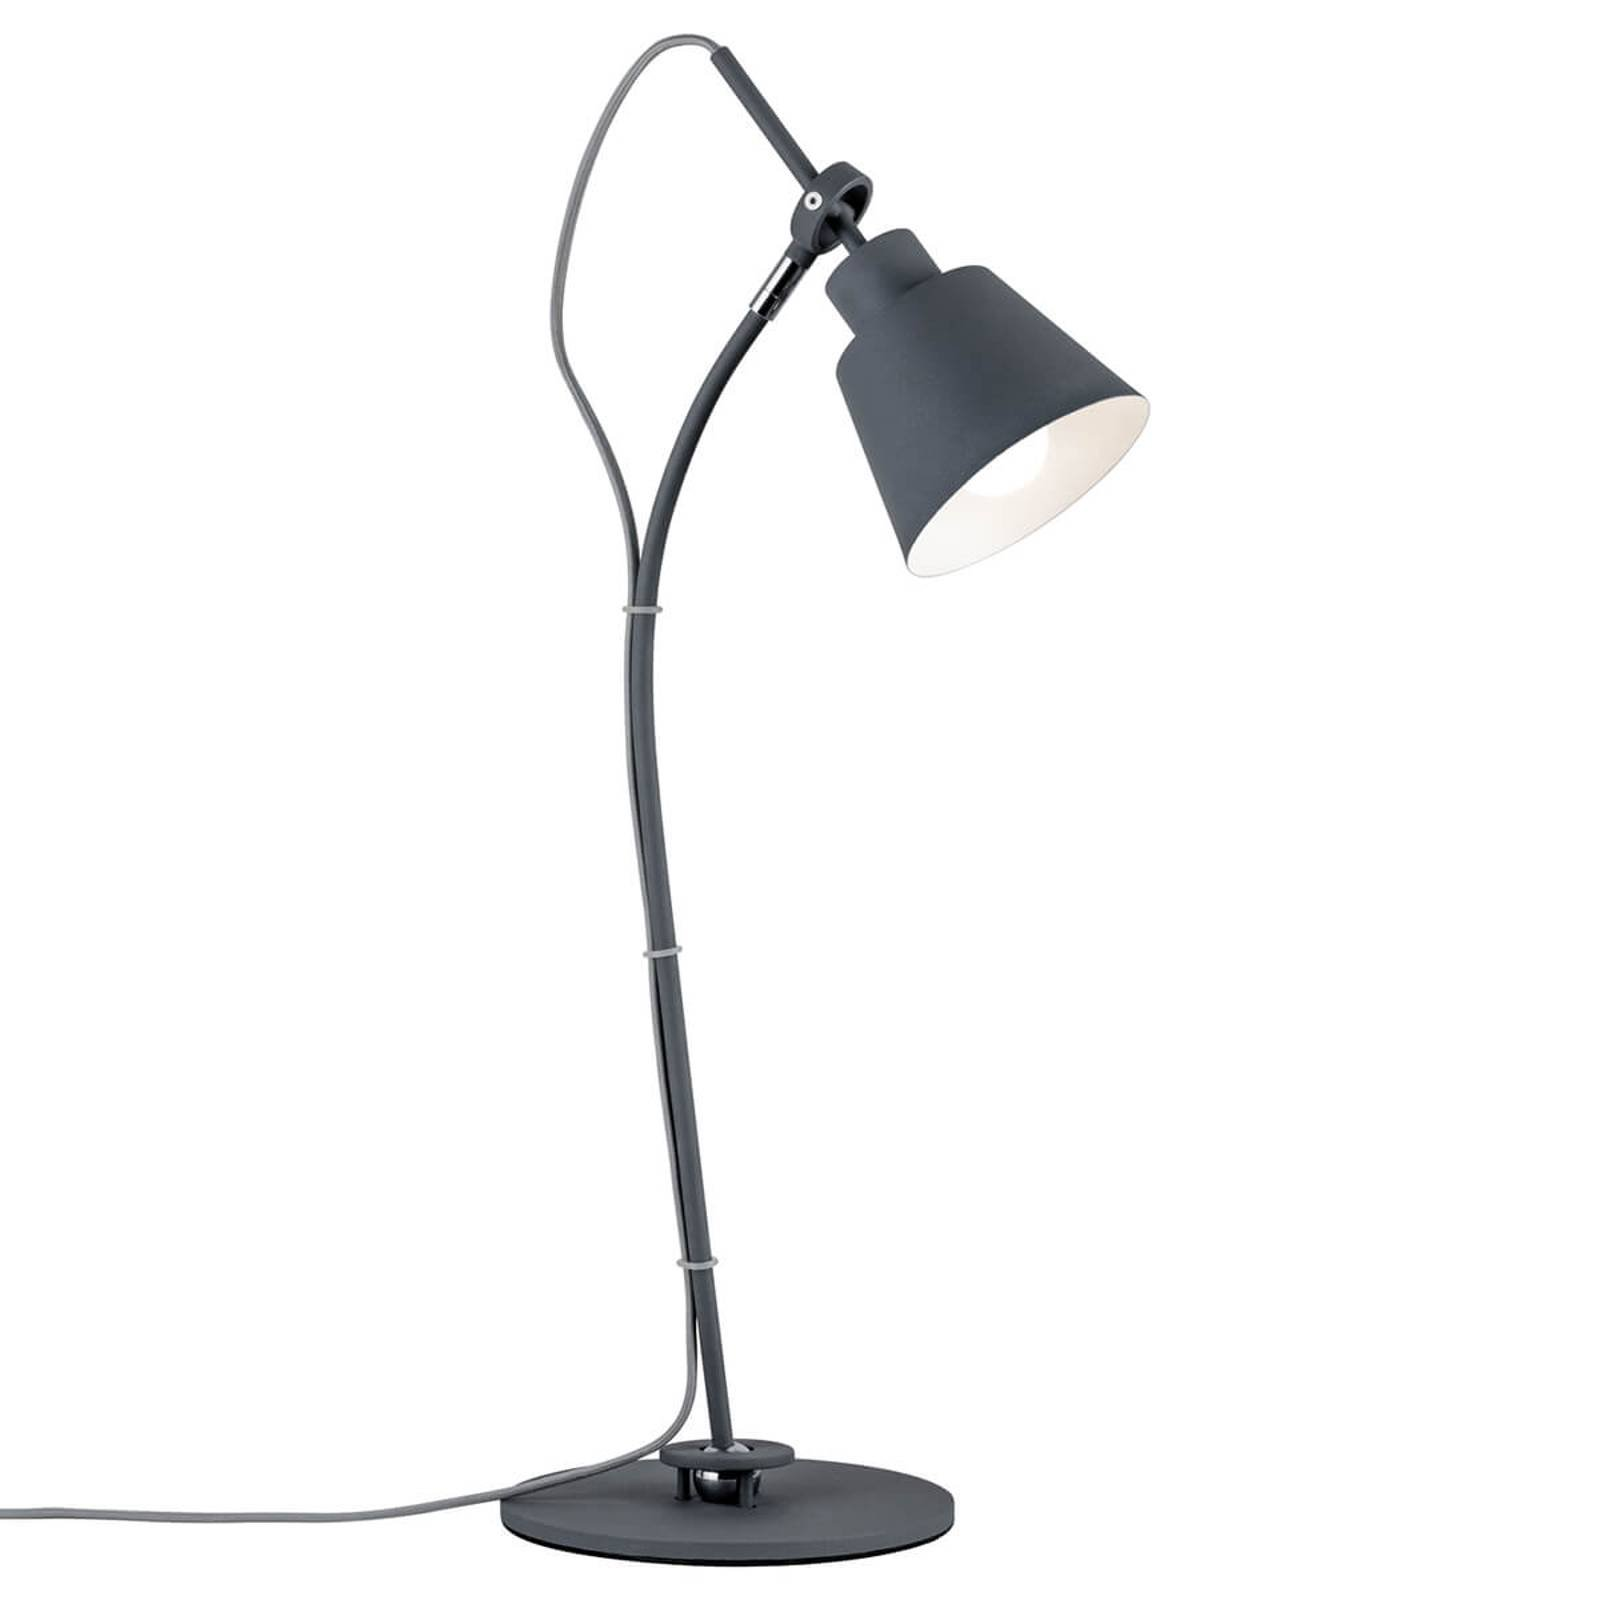 Bøybar bordlampe Thala i trendy grått